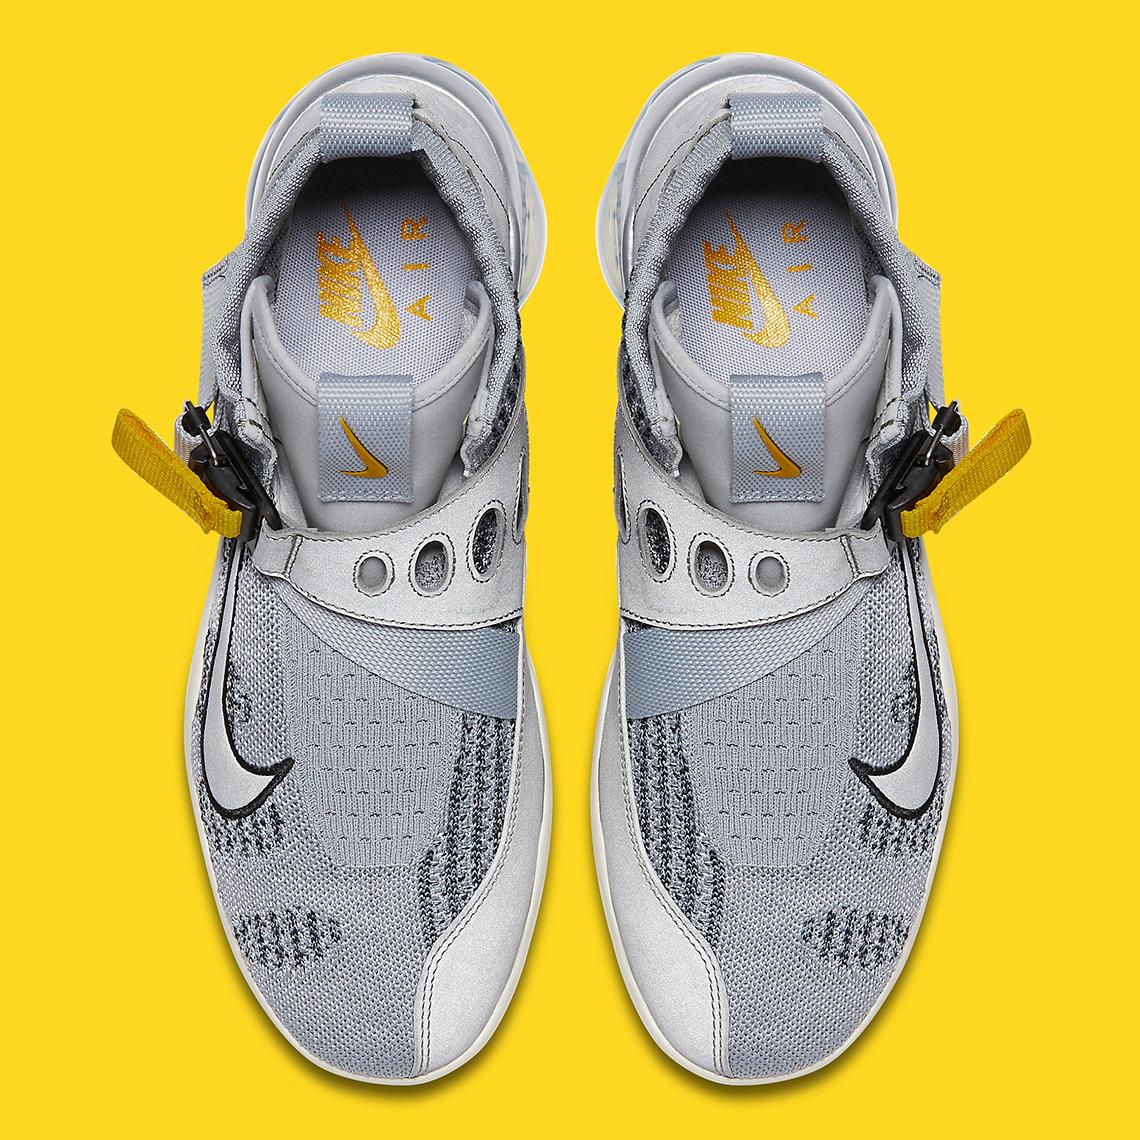 a9856896aeb ... Vapormax Premier Flyknit. Nike SNKRS 10am ET  BSTN Available.  Advertisement. Advertisement